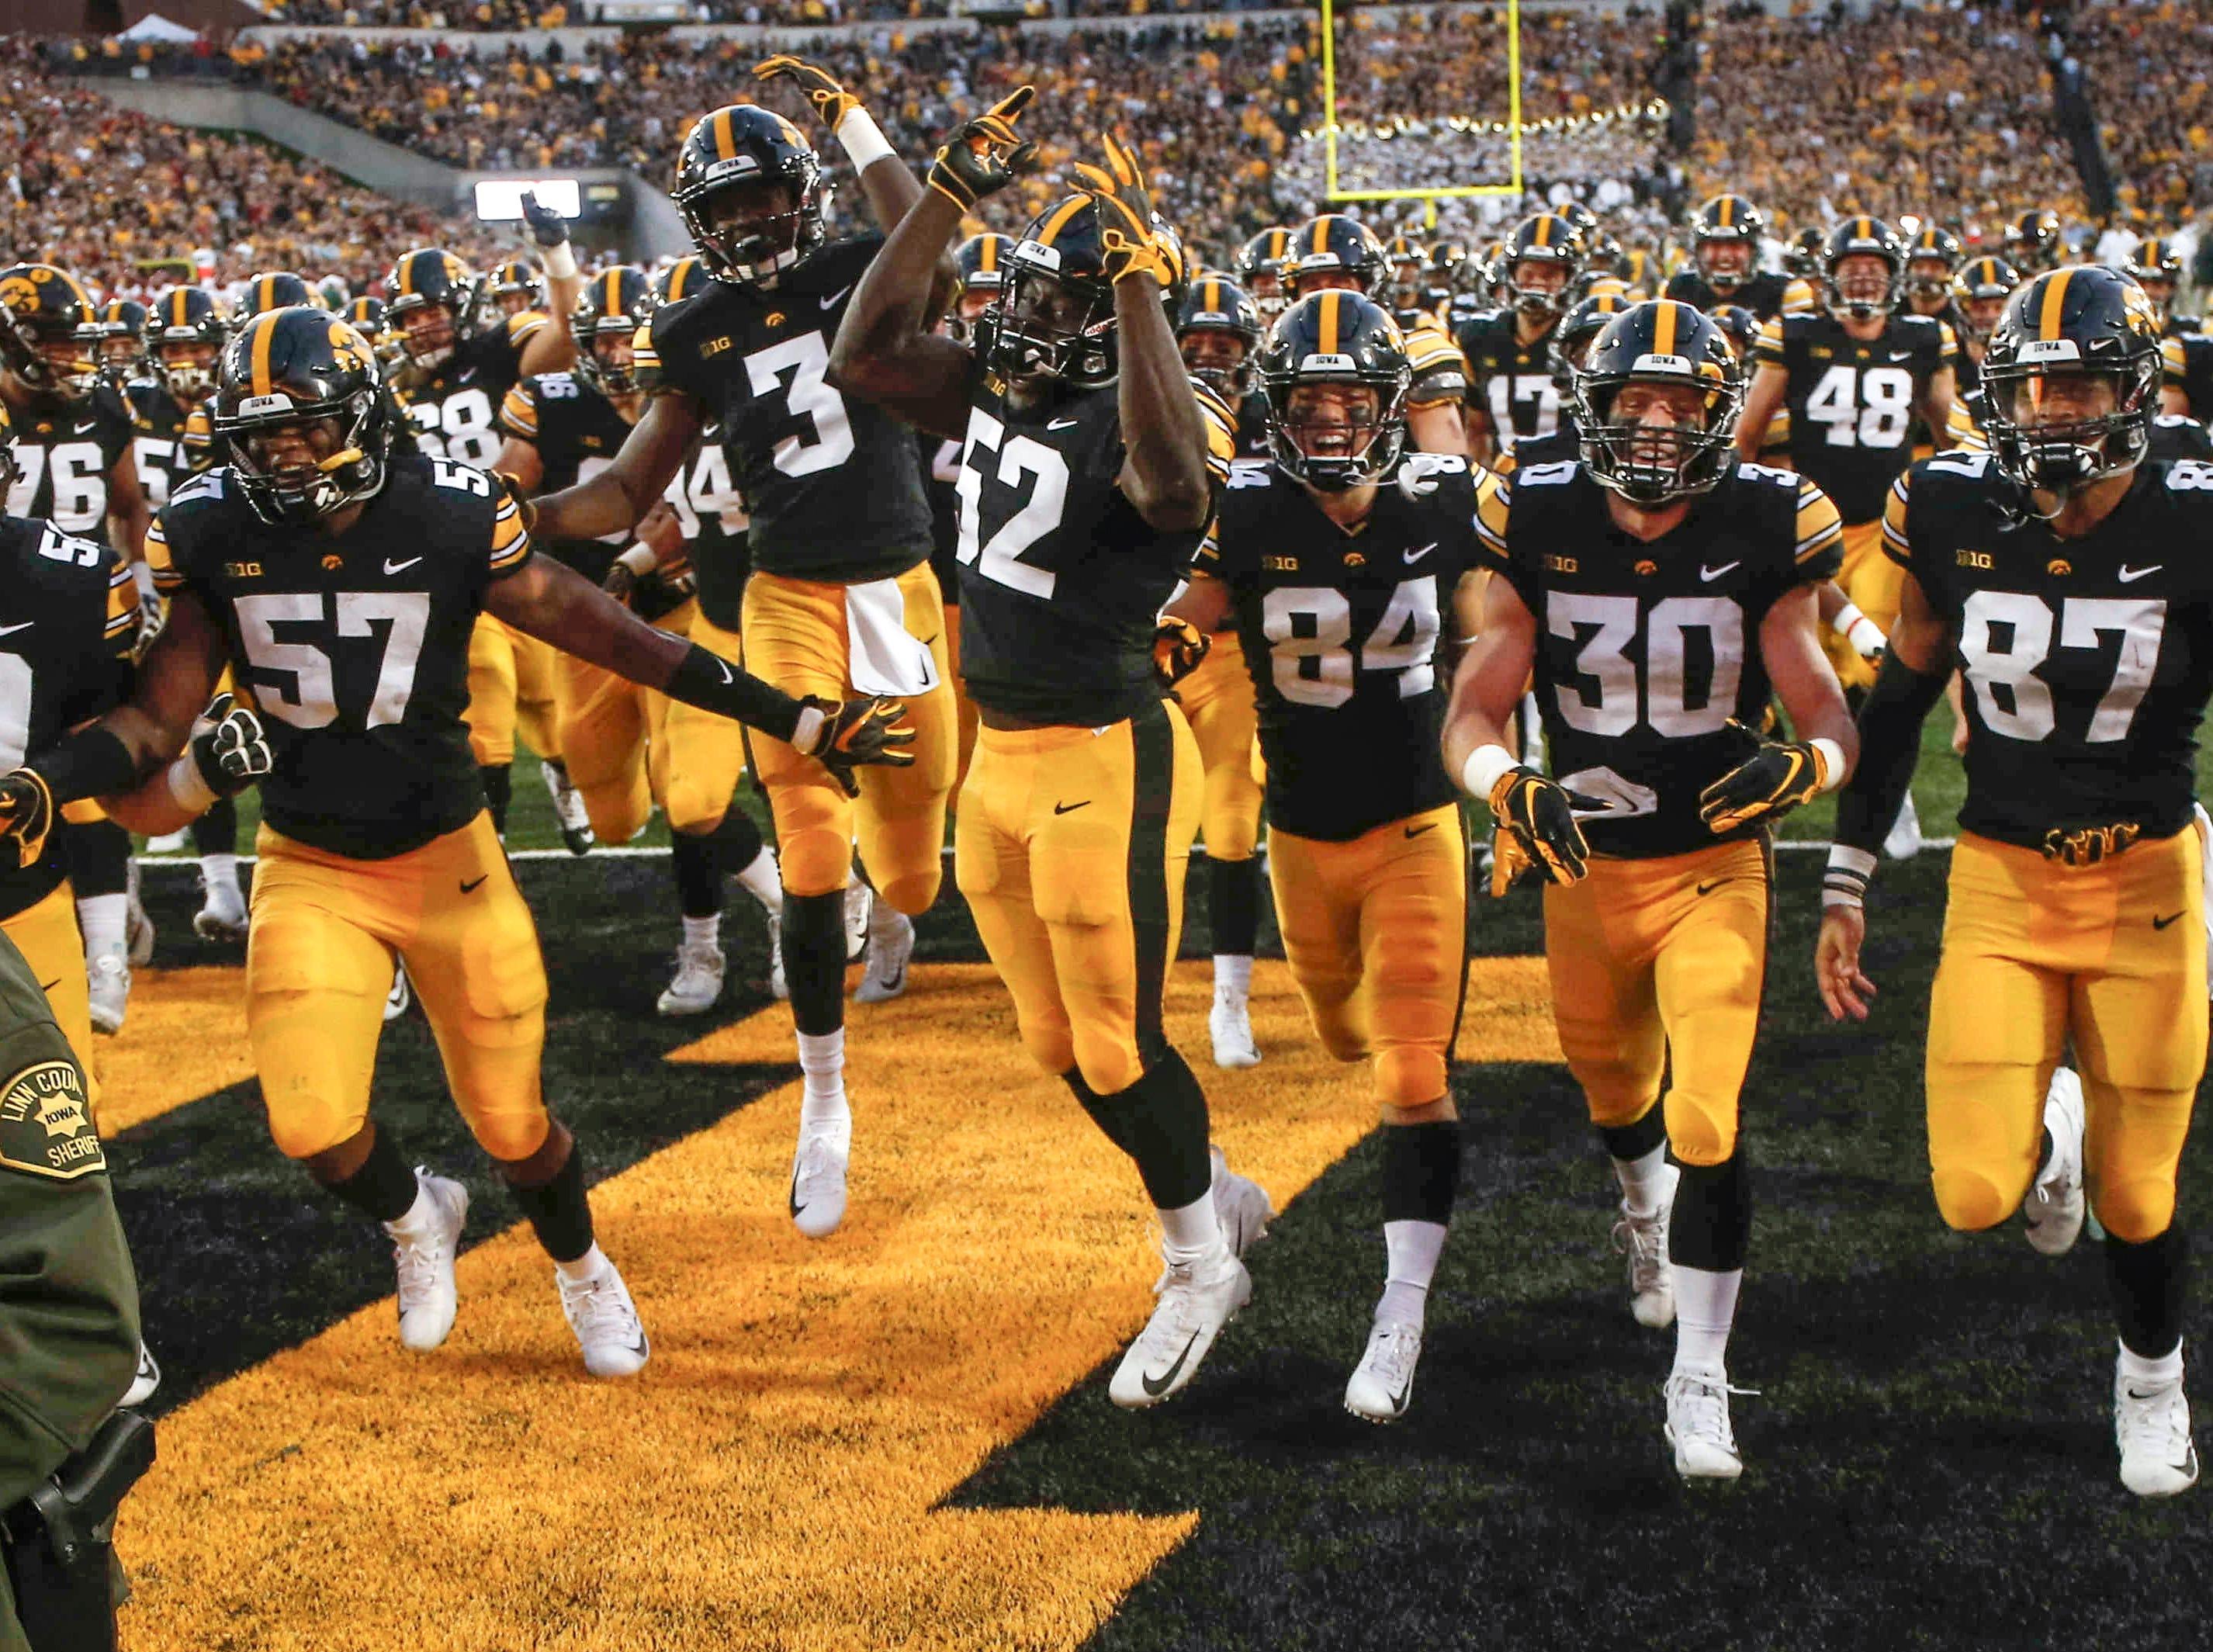 Members of the Iowa football team celebrate a 13-3 win over Iowa State on Saturday, Sept. 8 2018, at Kinnick Stadium in Iowa City.